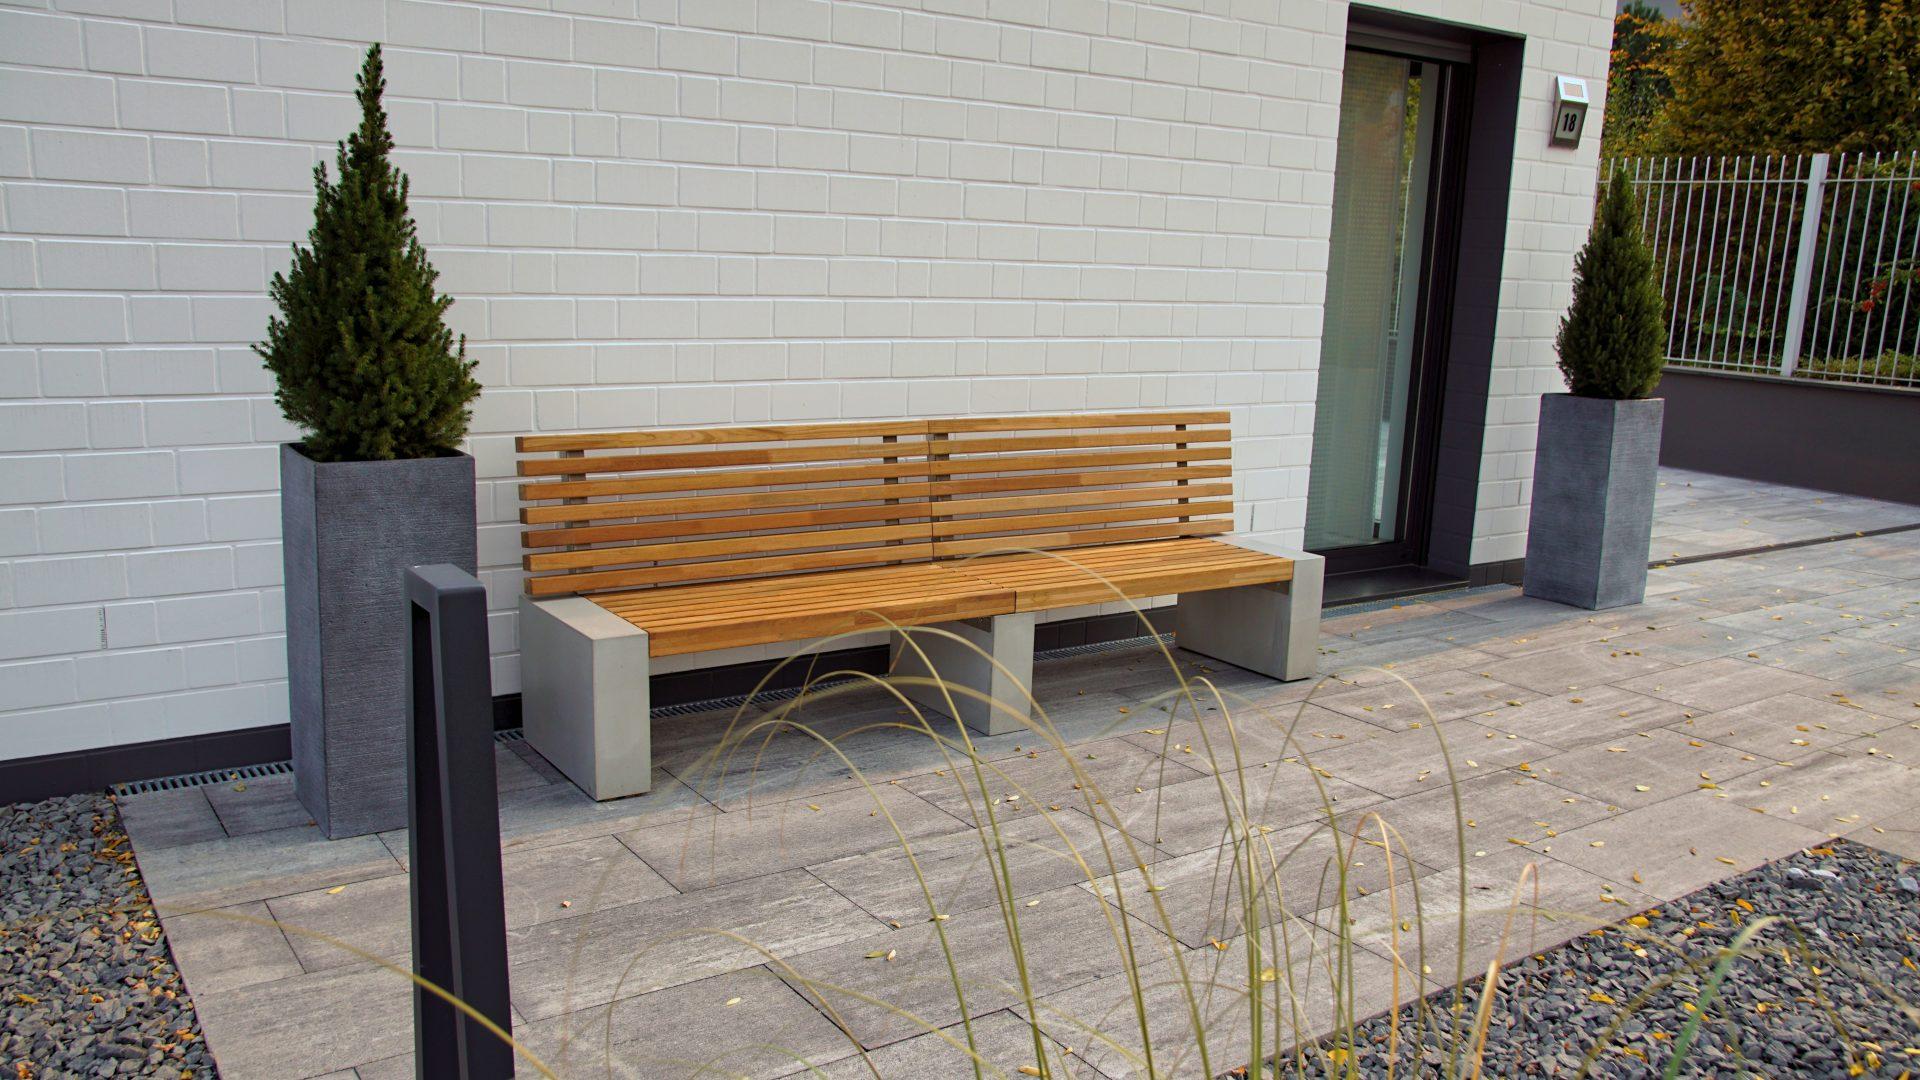 gartenbank in bankirai und hellem beton | b&k design